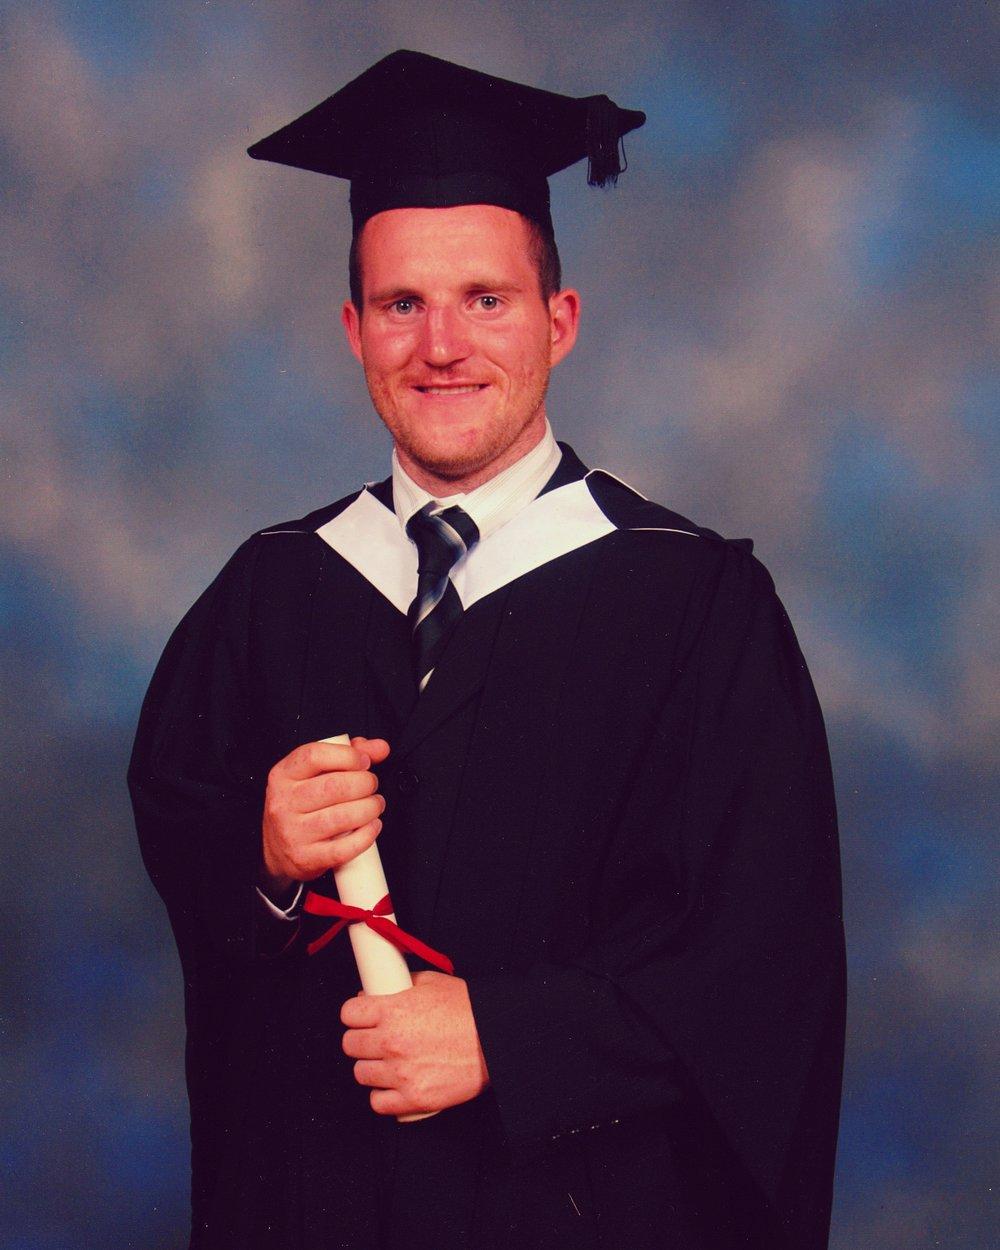 conor-graduates-as-architectural-technician-maker-gents.jpg